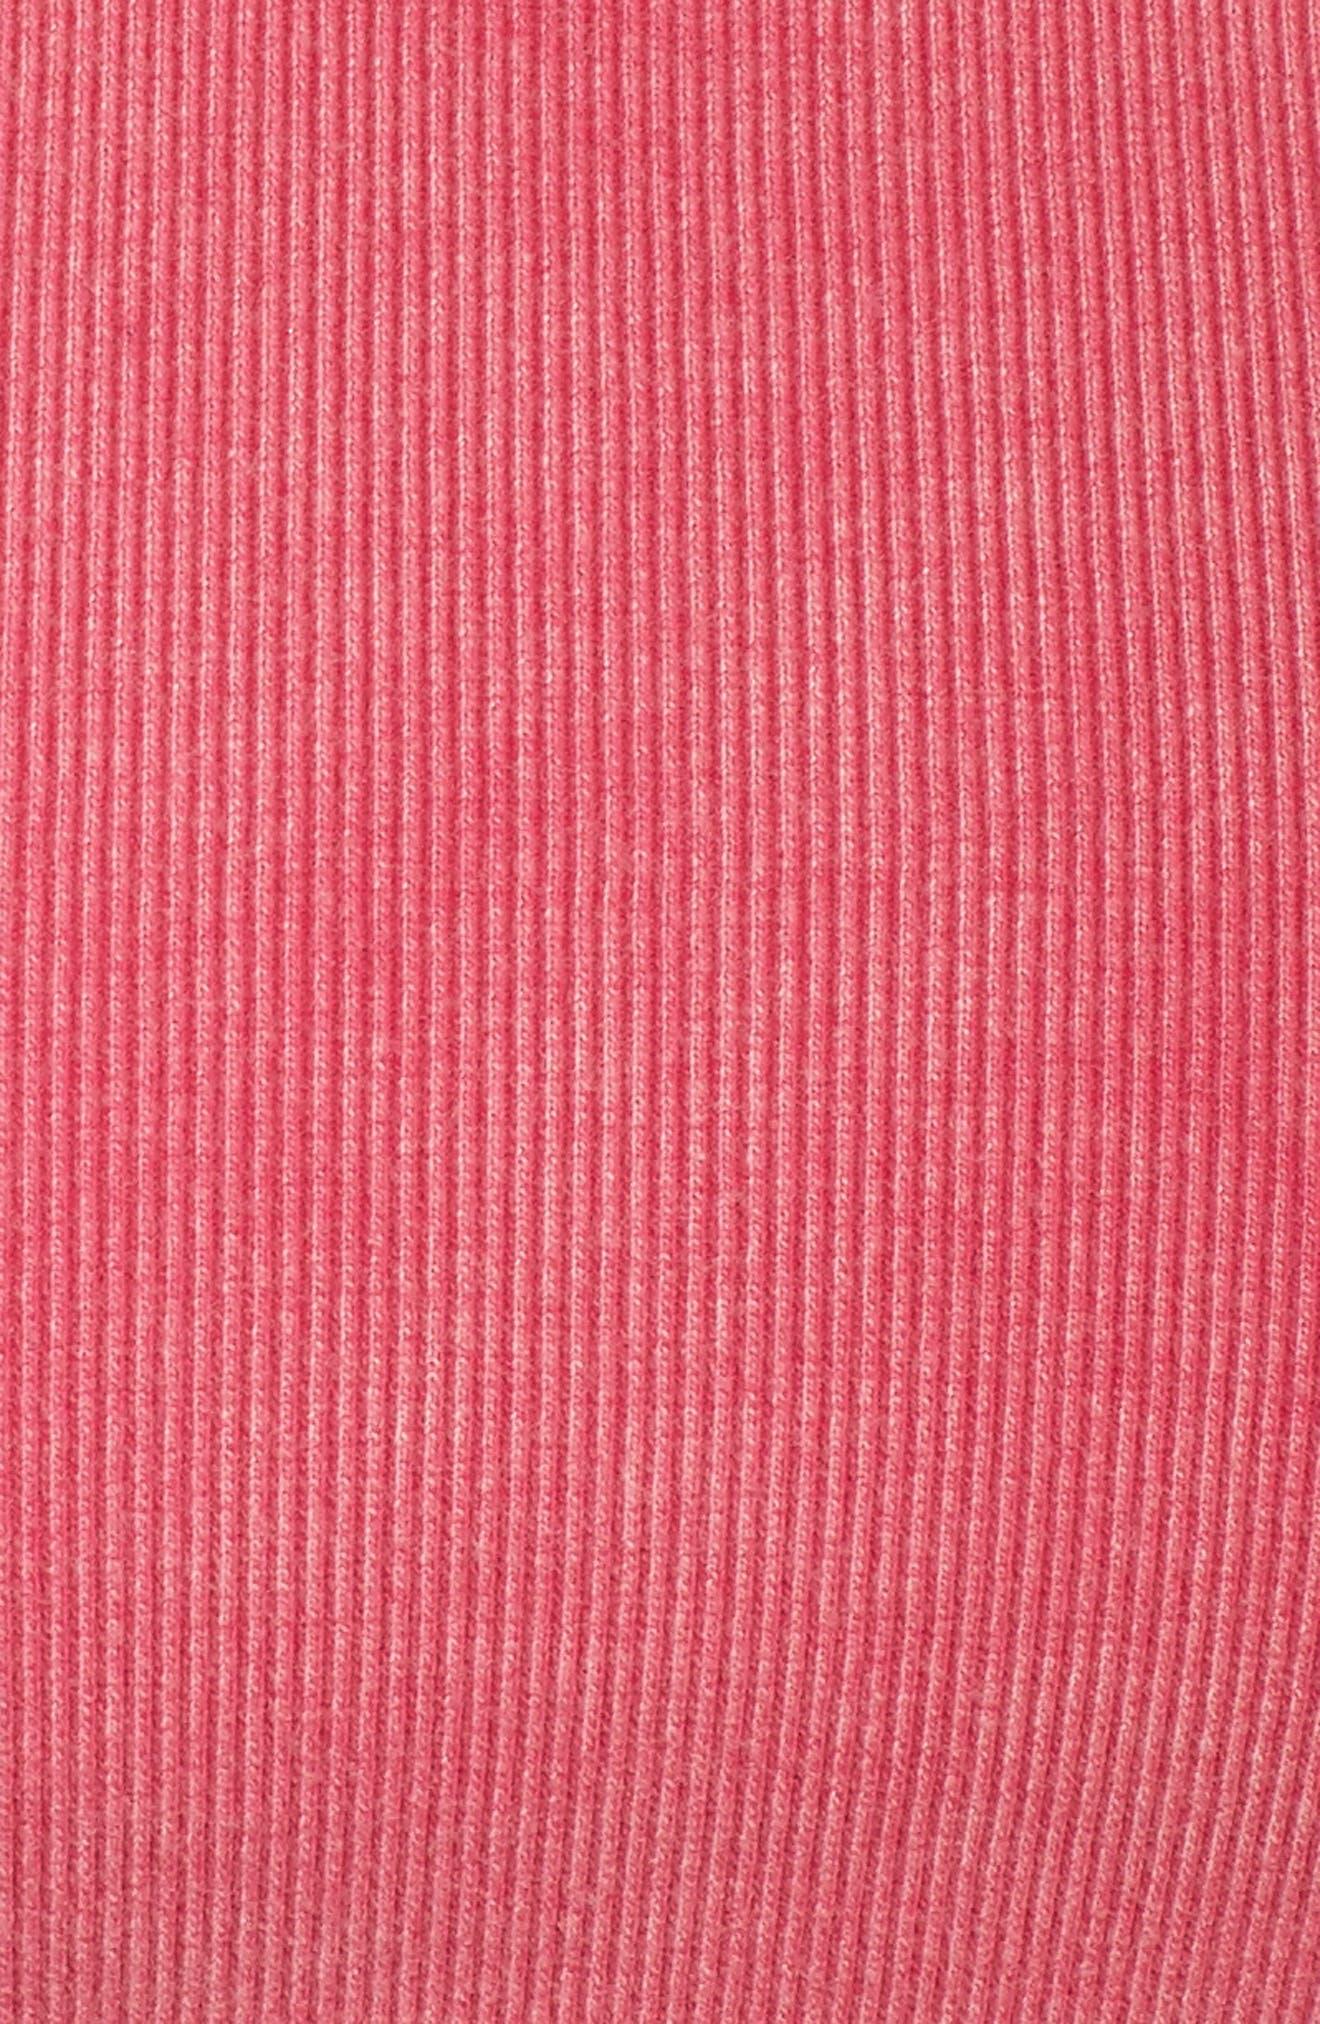 FP Movement Lua Ribbed Bra,                             Alternate thumbnail 6, color,                             Pink